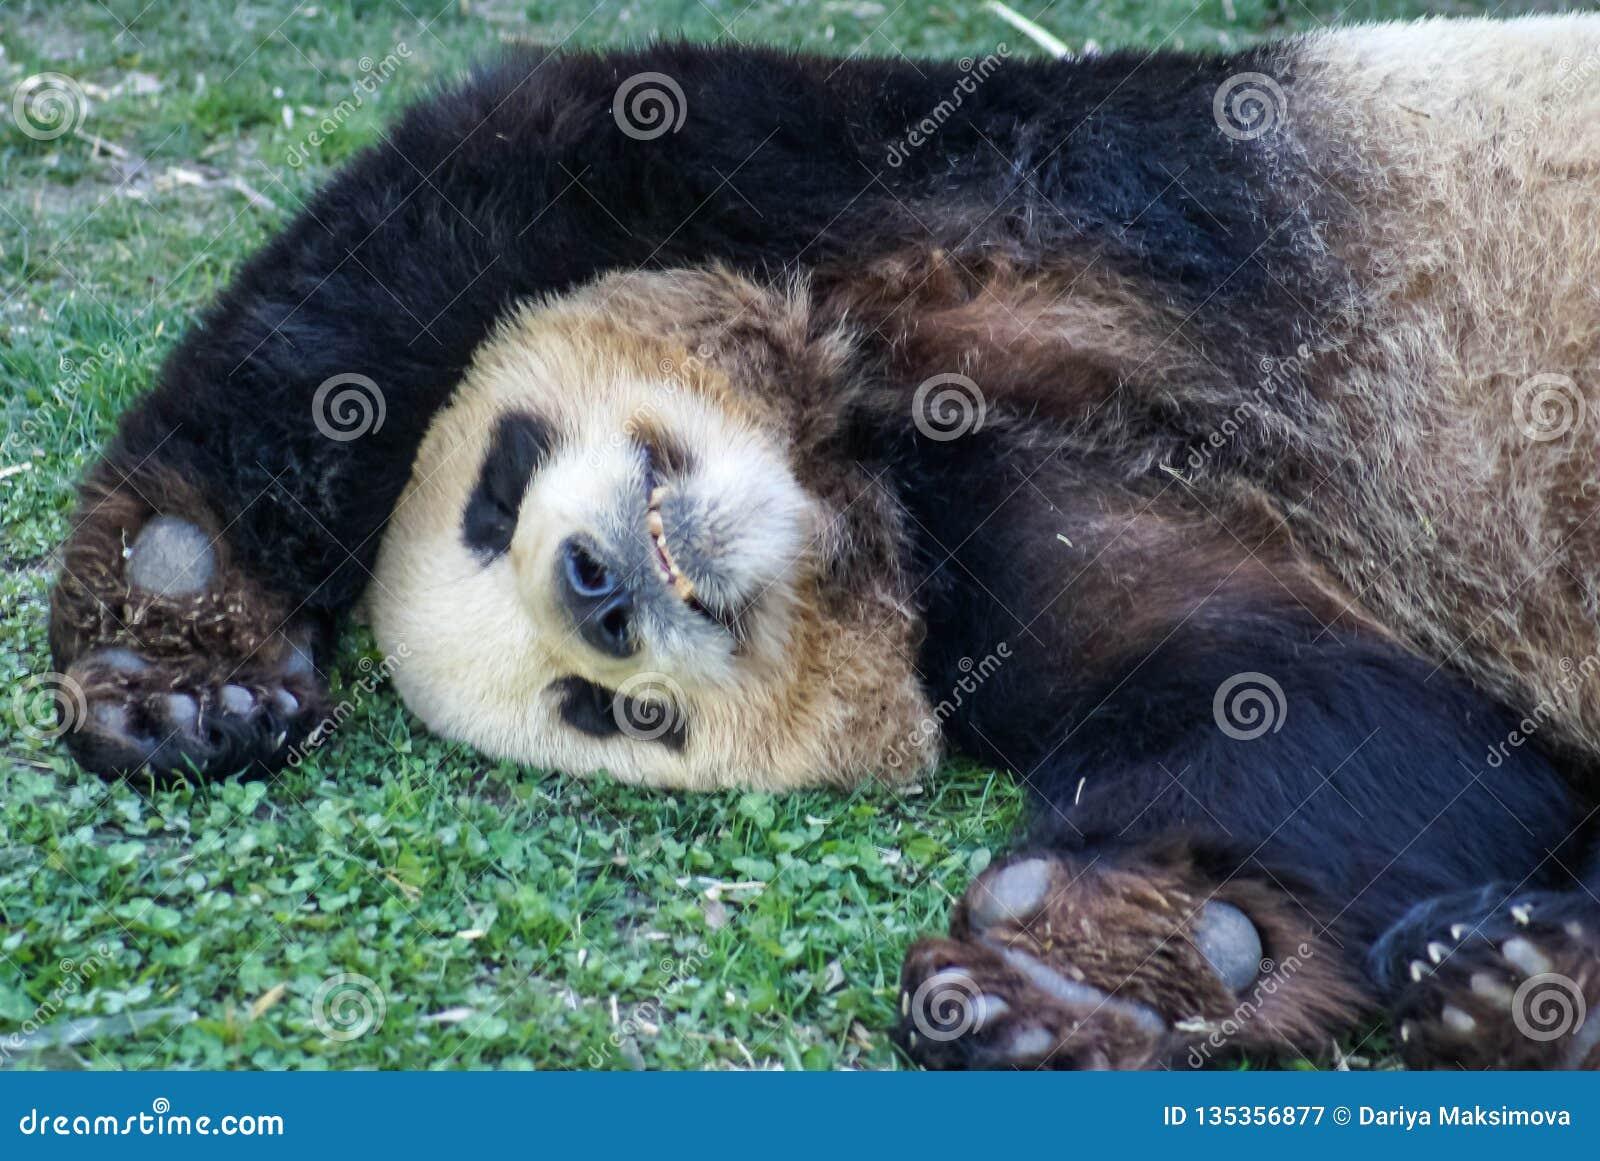 Big black-white panda bear sleeping with paws up give up